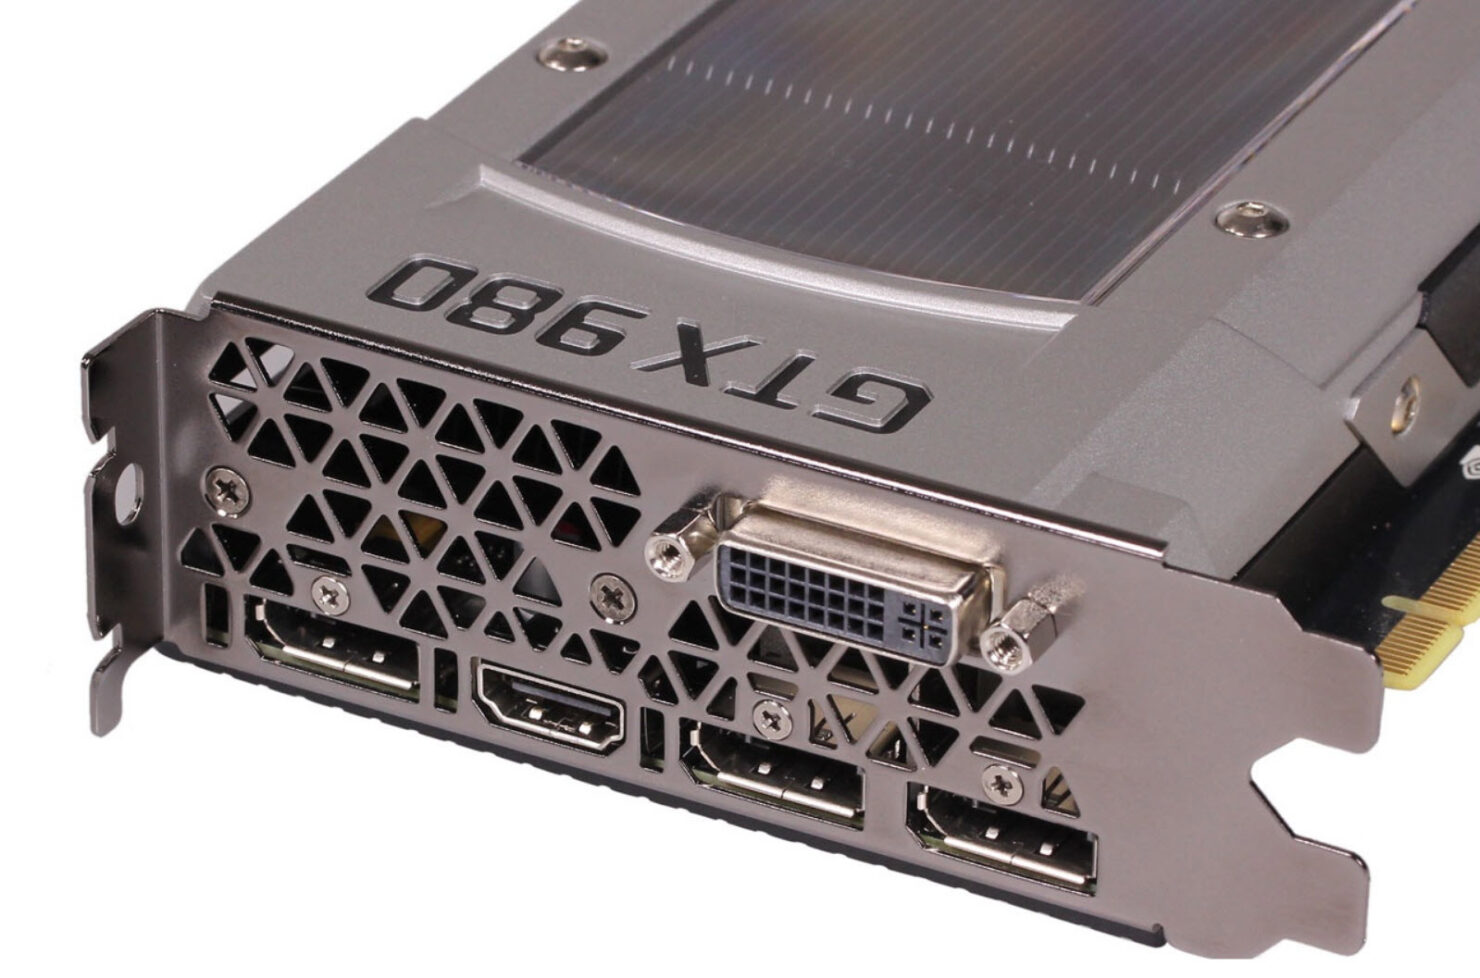 nvidia-geforce-gtx-980_8